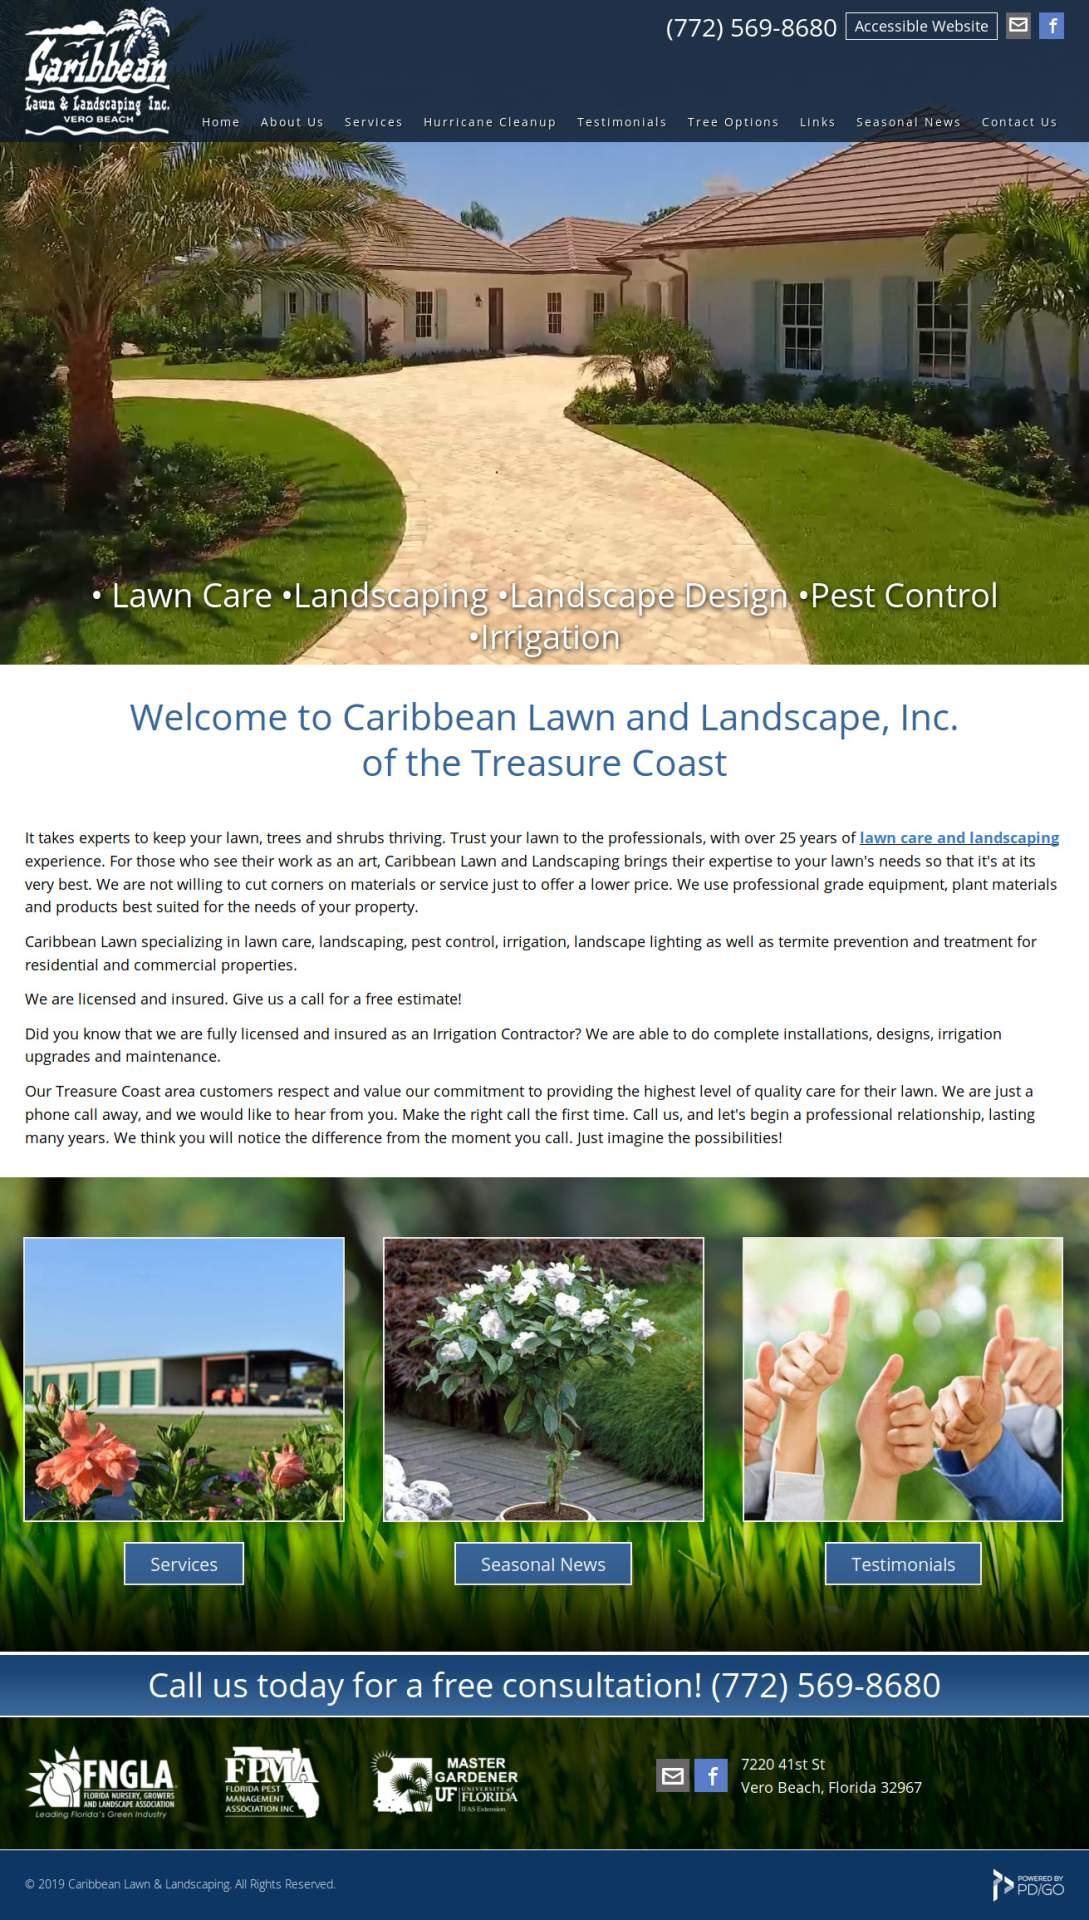 caribbean lawn